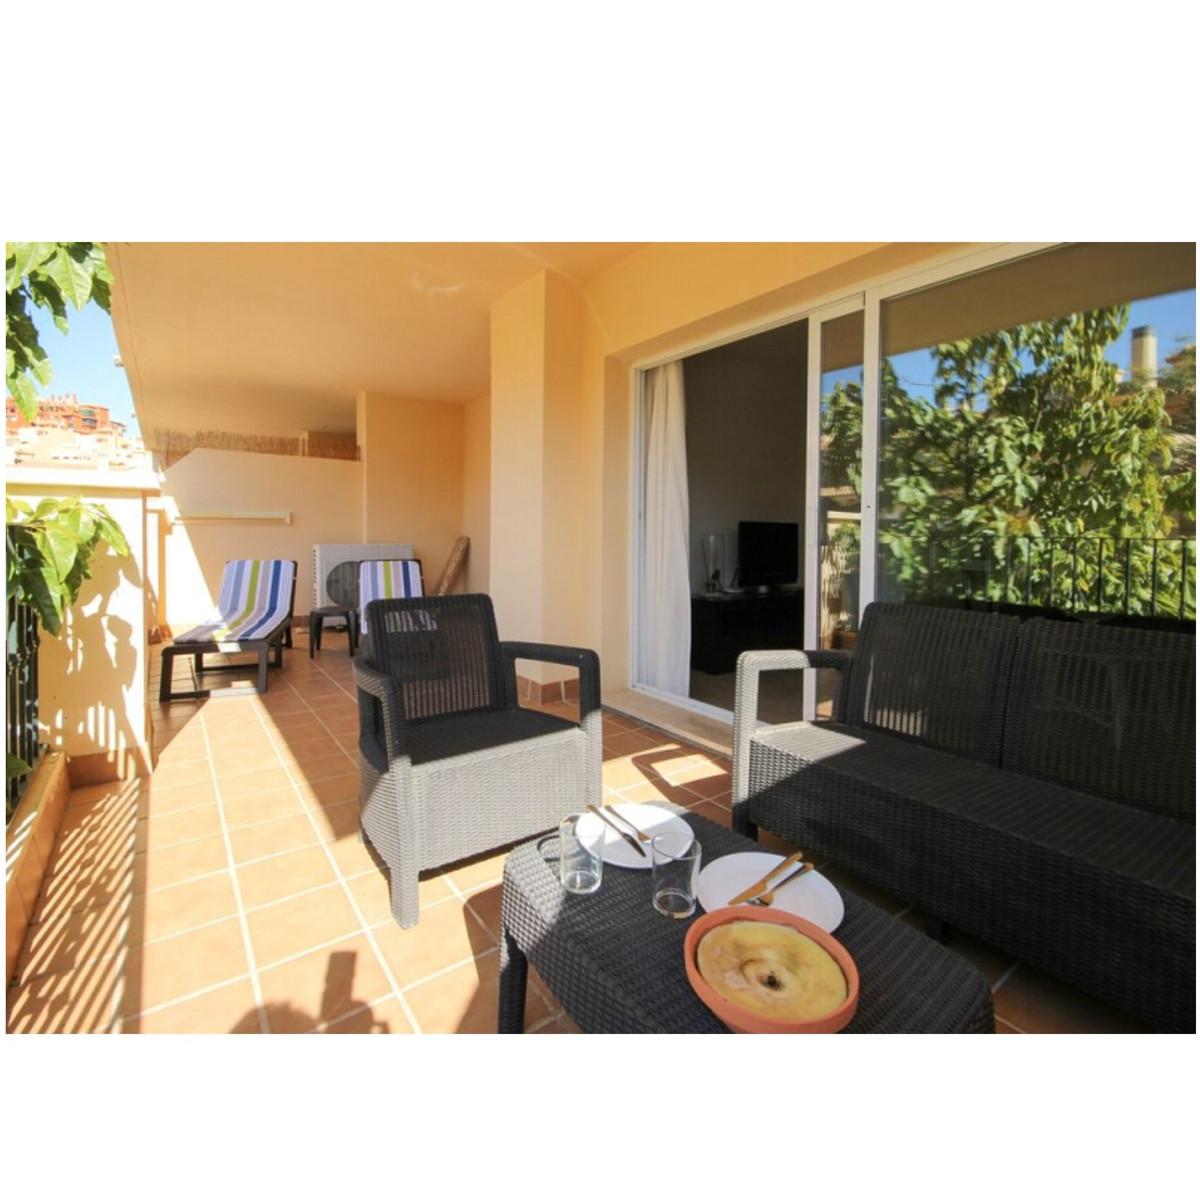 Appartement Marbella Banus à vendre à Calahonda - R3764521